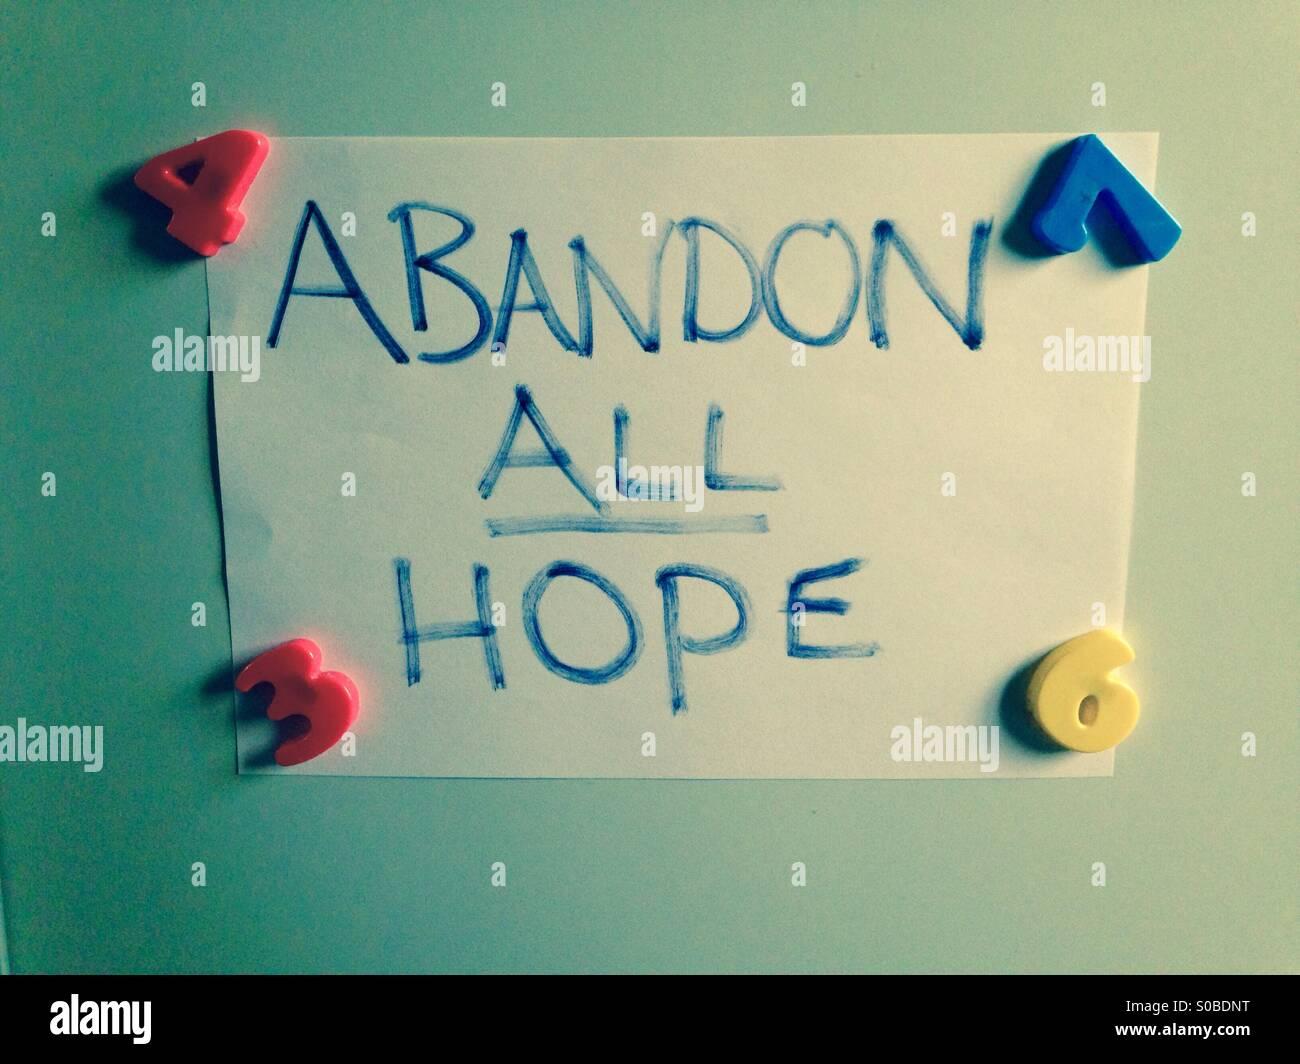 Abandon All Hope - Stock Image